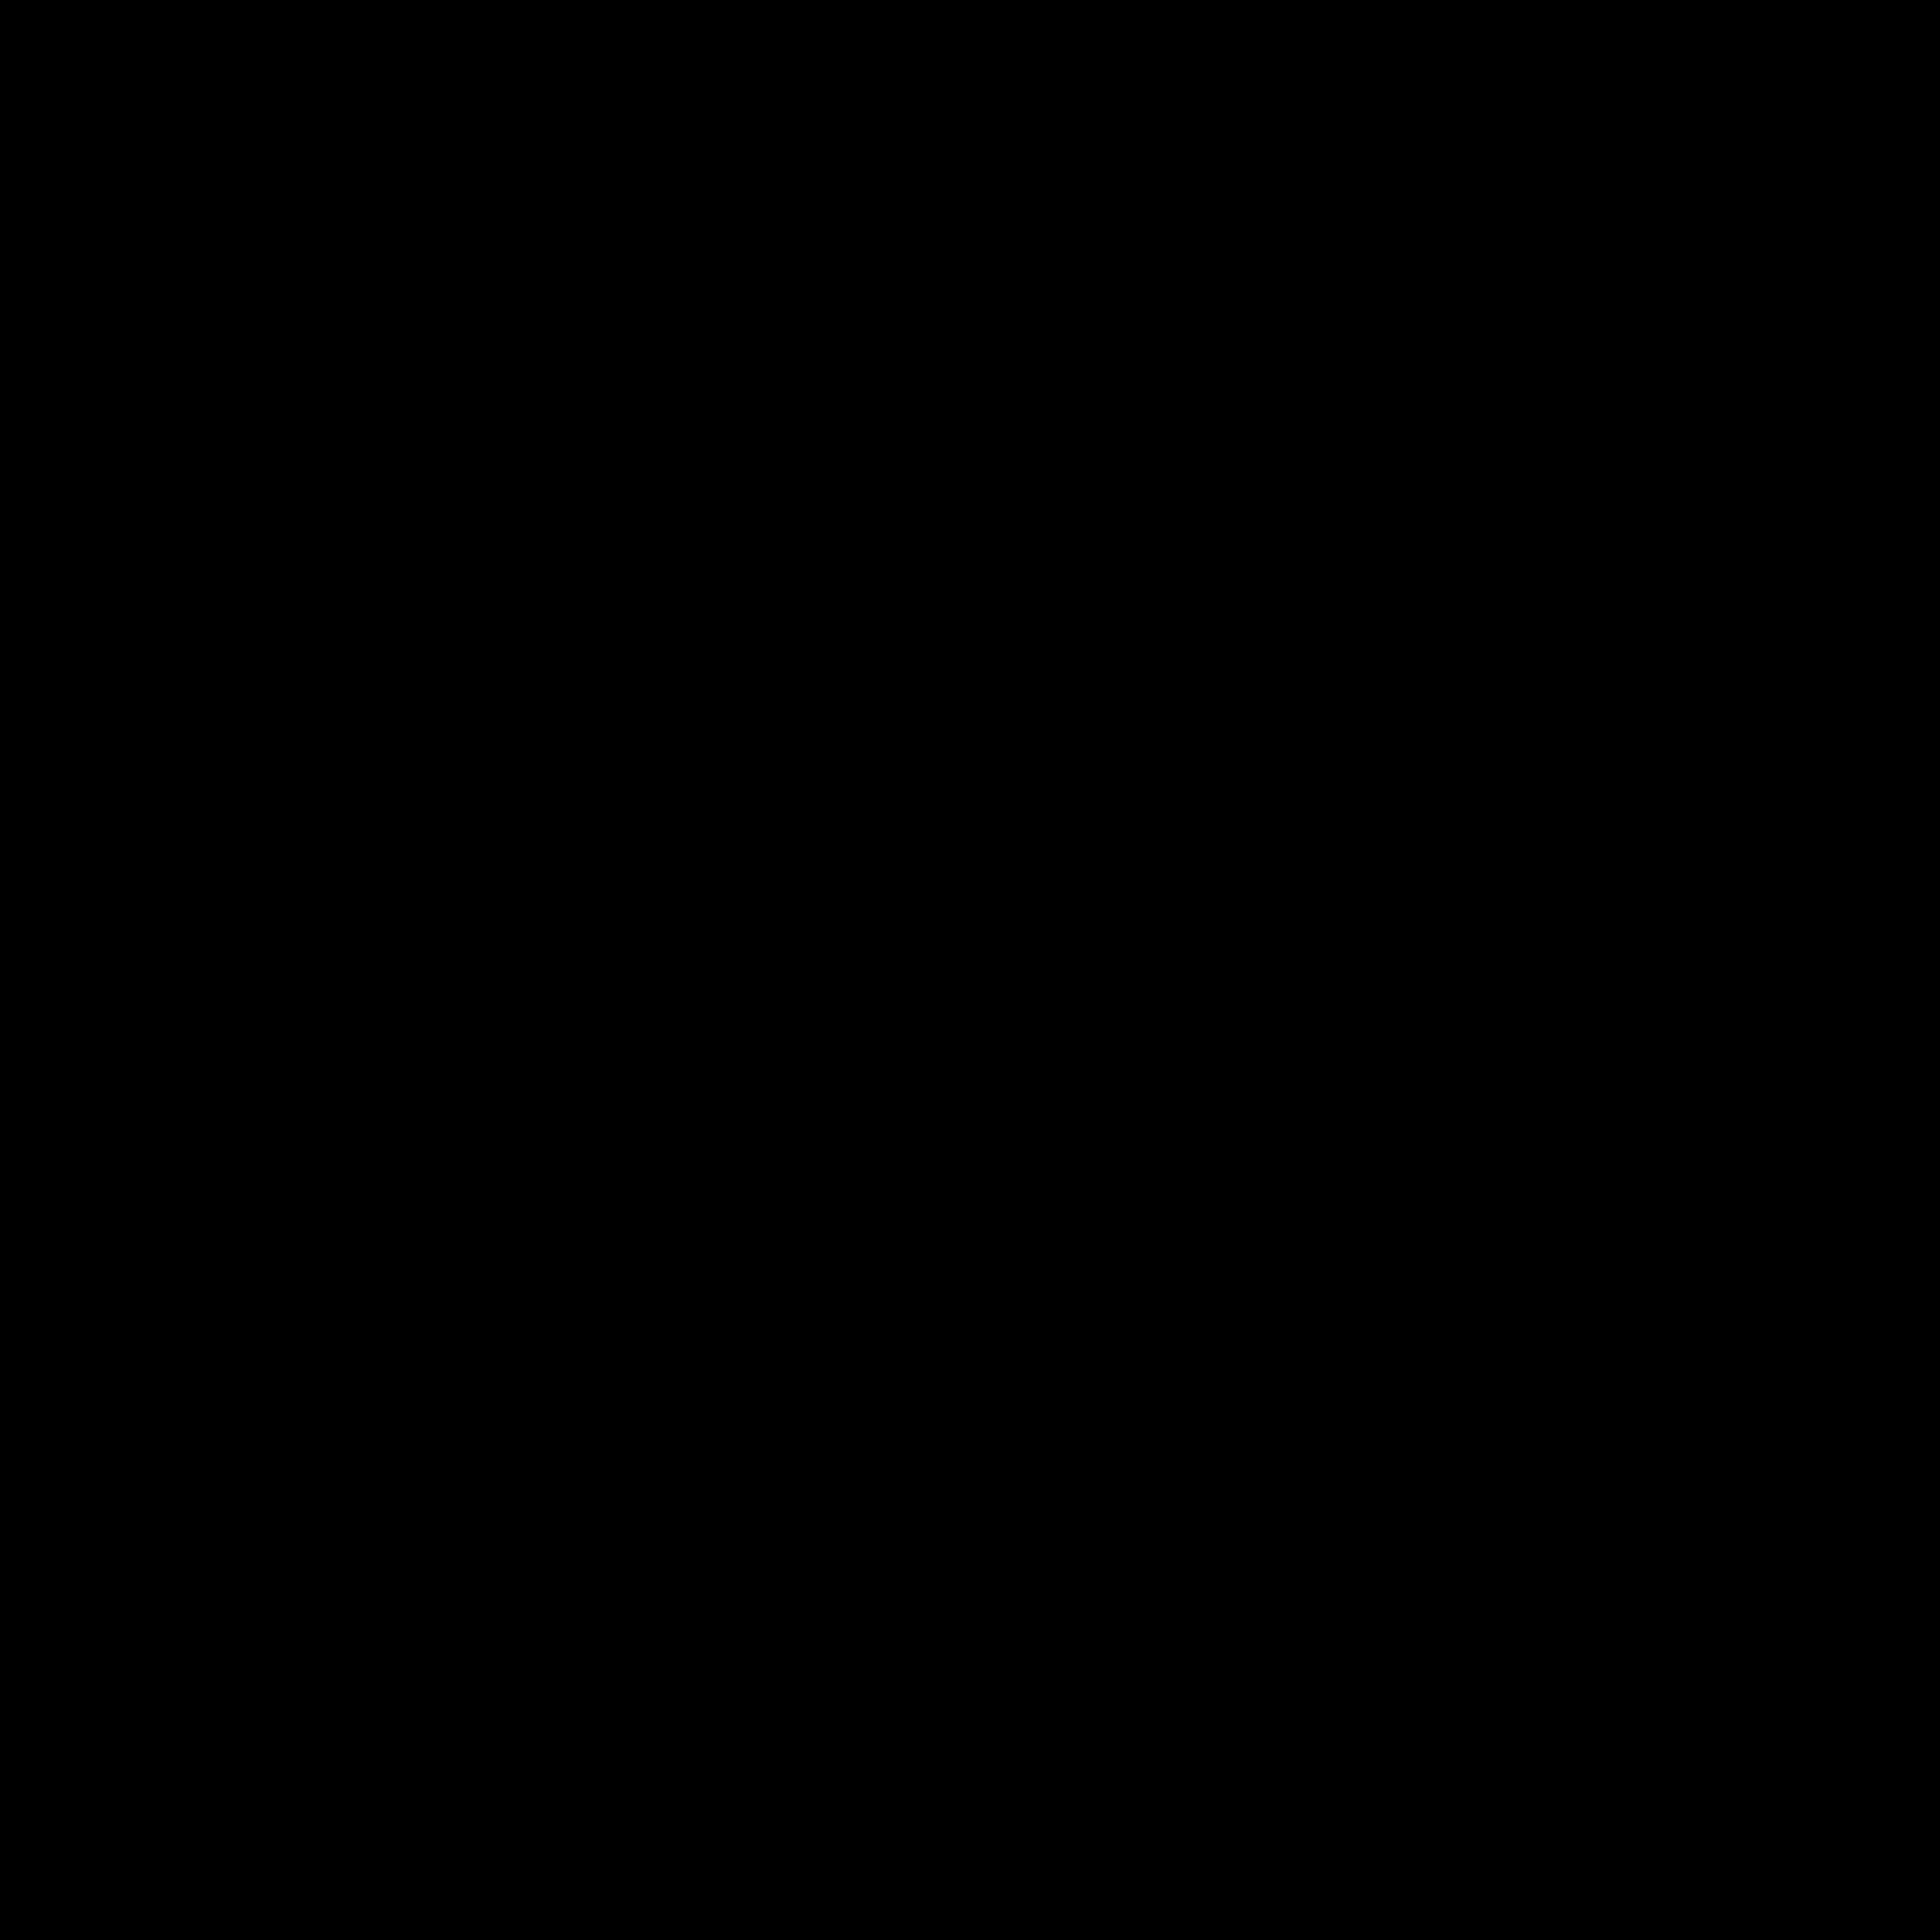 2318x2318 Clipart